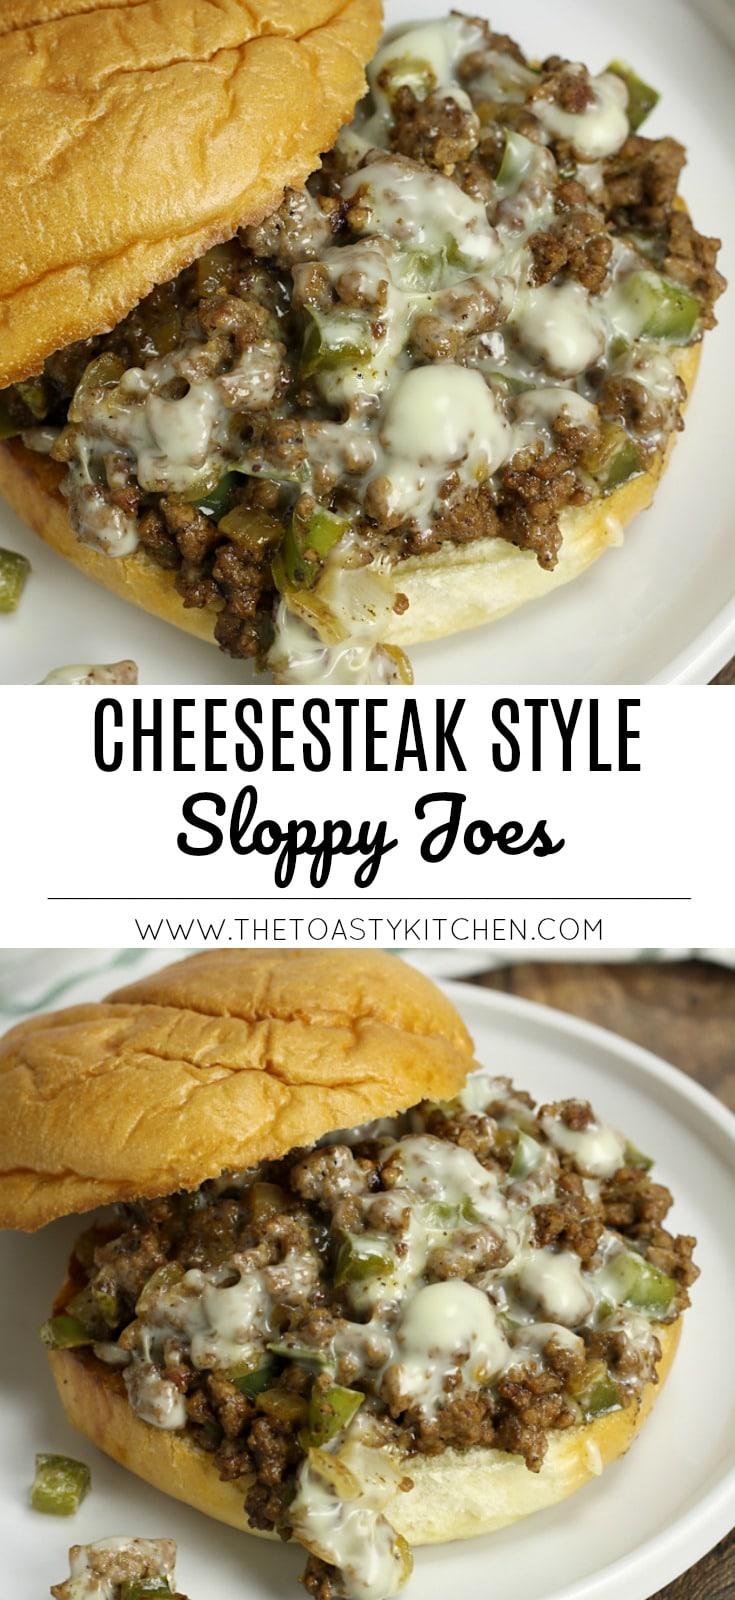 Cheesesteak Style Sloppy Joes by The Toasty Kitchen